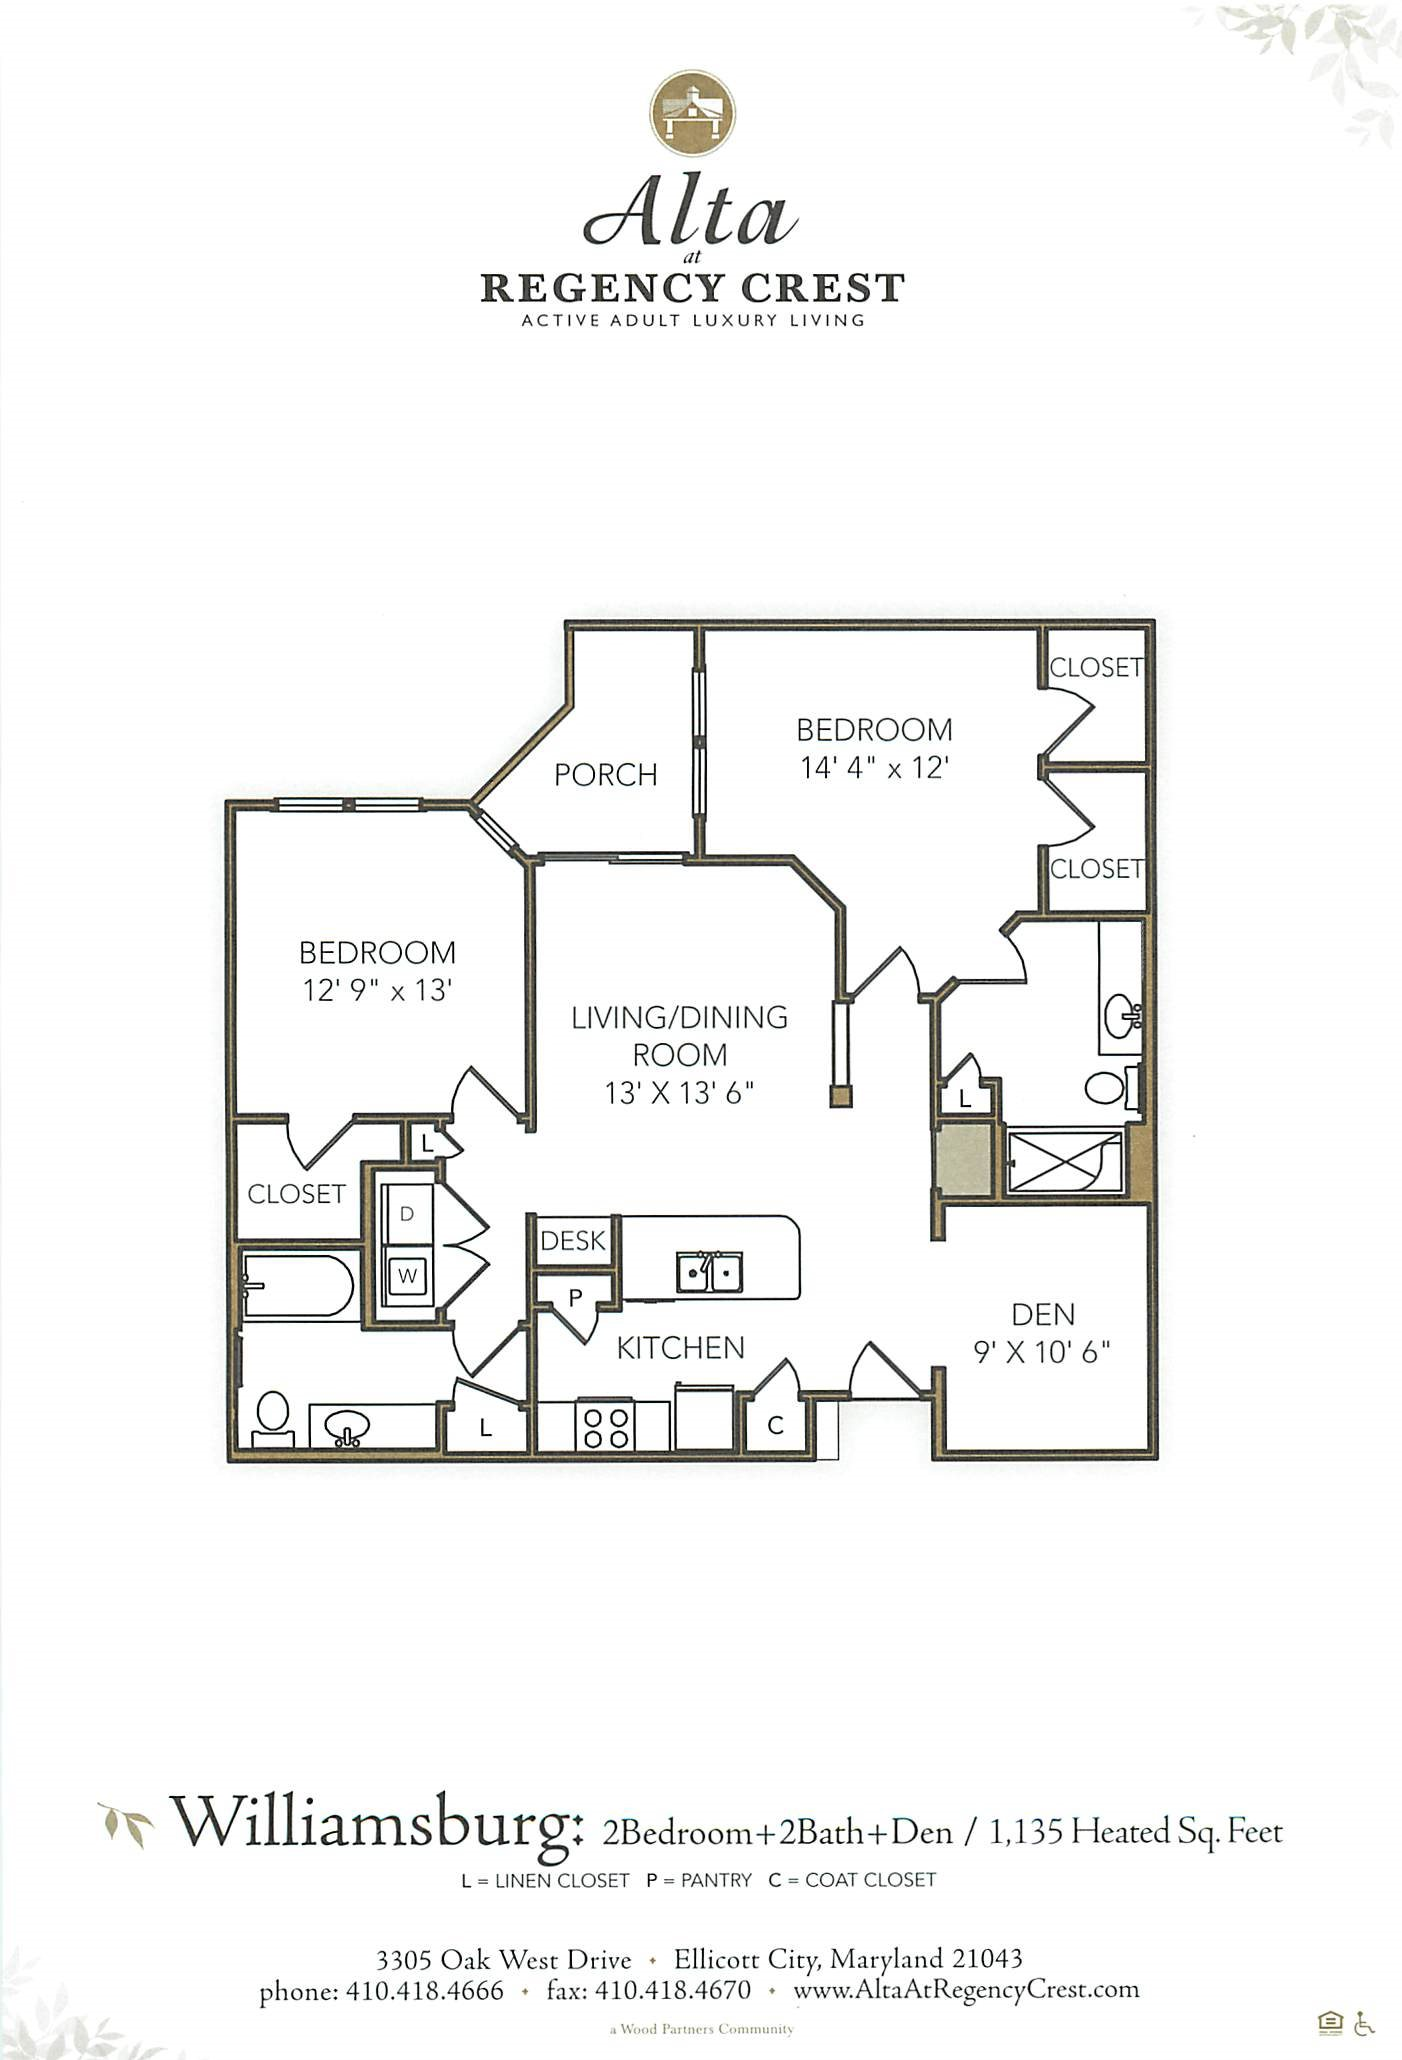 2 Bed/2 Bath Den-Williamsburg Floor Plan 5